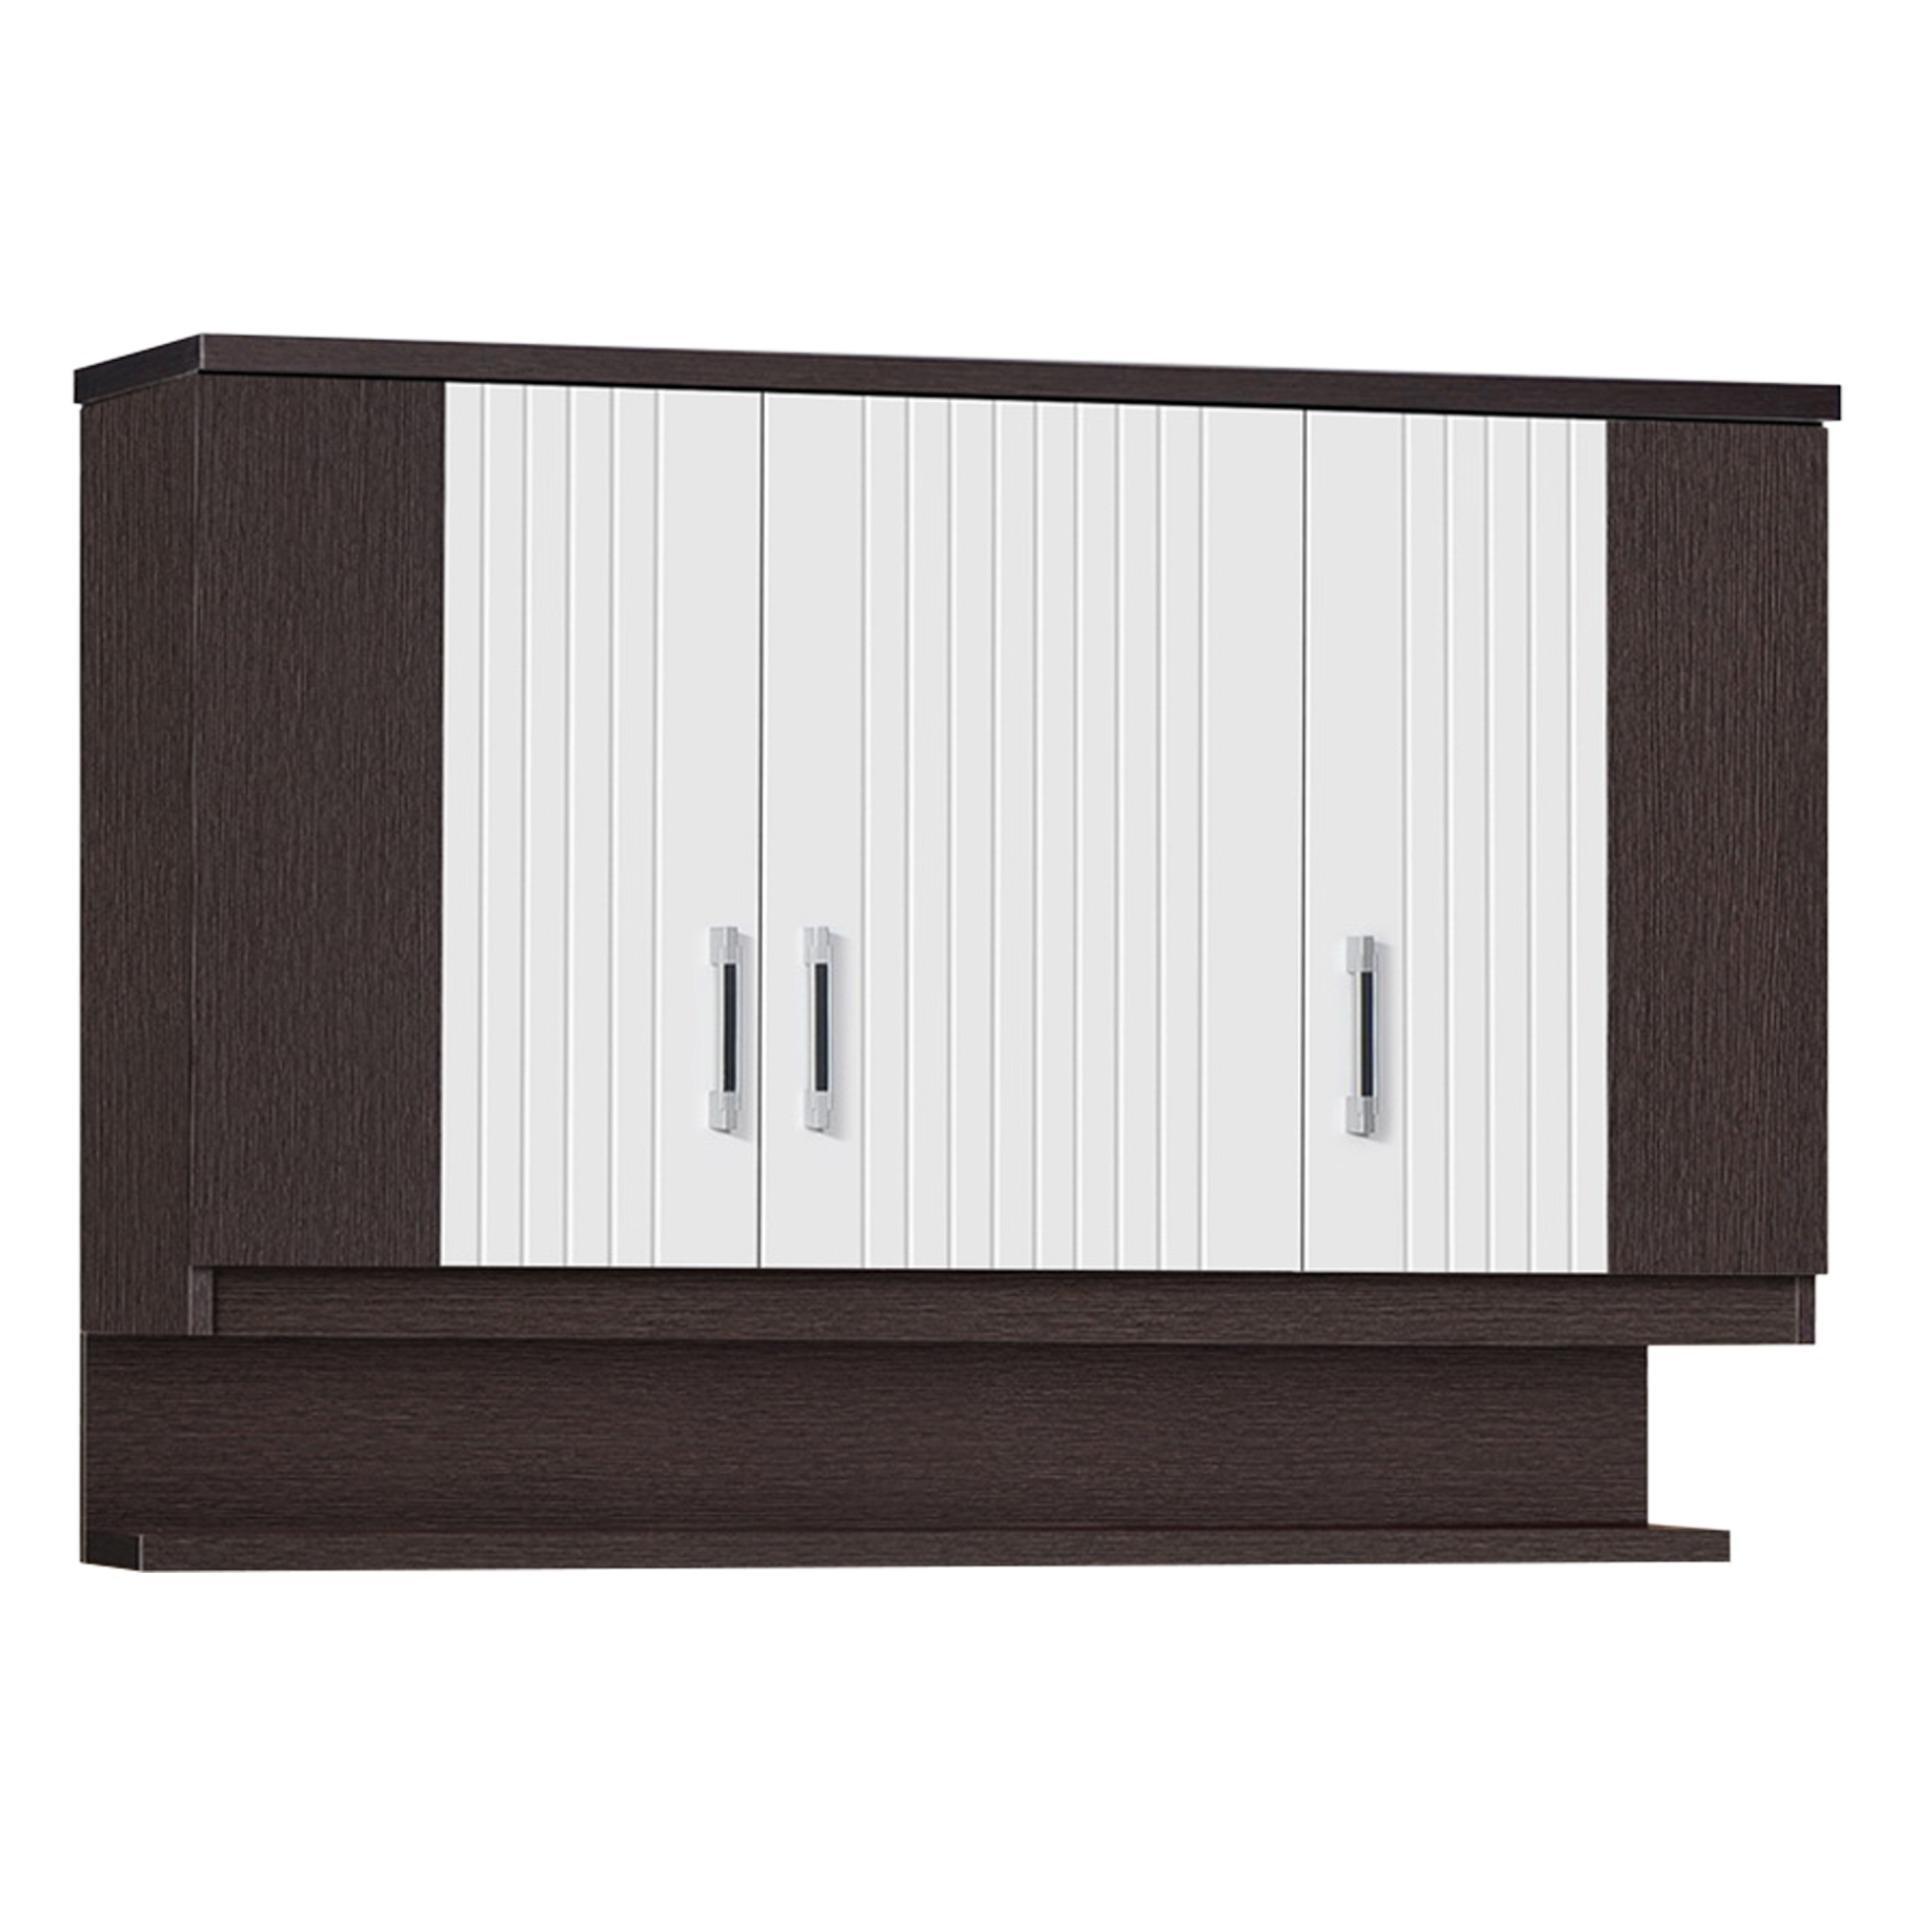 Kitchen set lemari dapur l mini ± 156 x 117 cm lazada indonesia